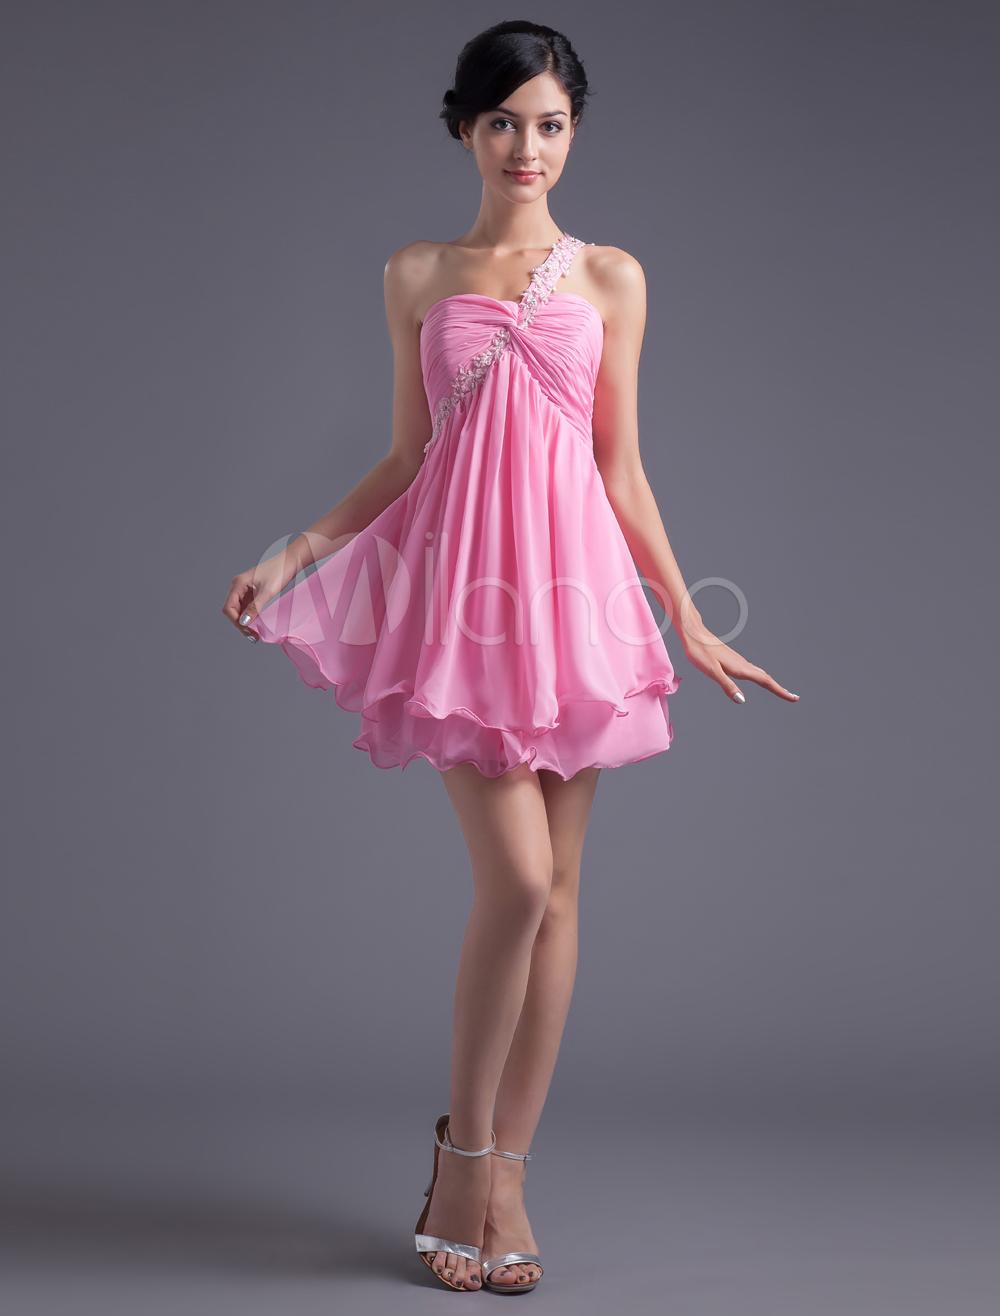 A-line Pink Chiffon Beading One-Shoulder Short Trendy Homecoming Dress (Wedding Cheap Party Dress) photo